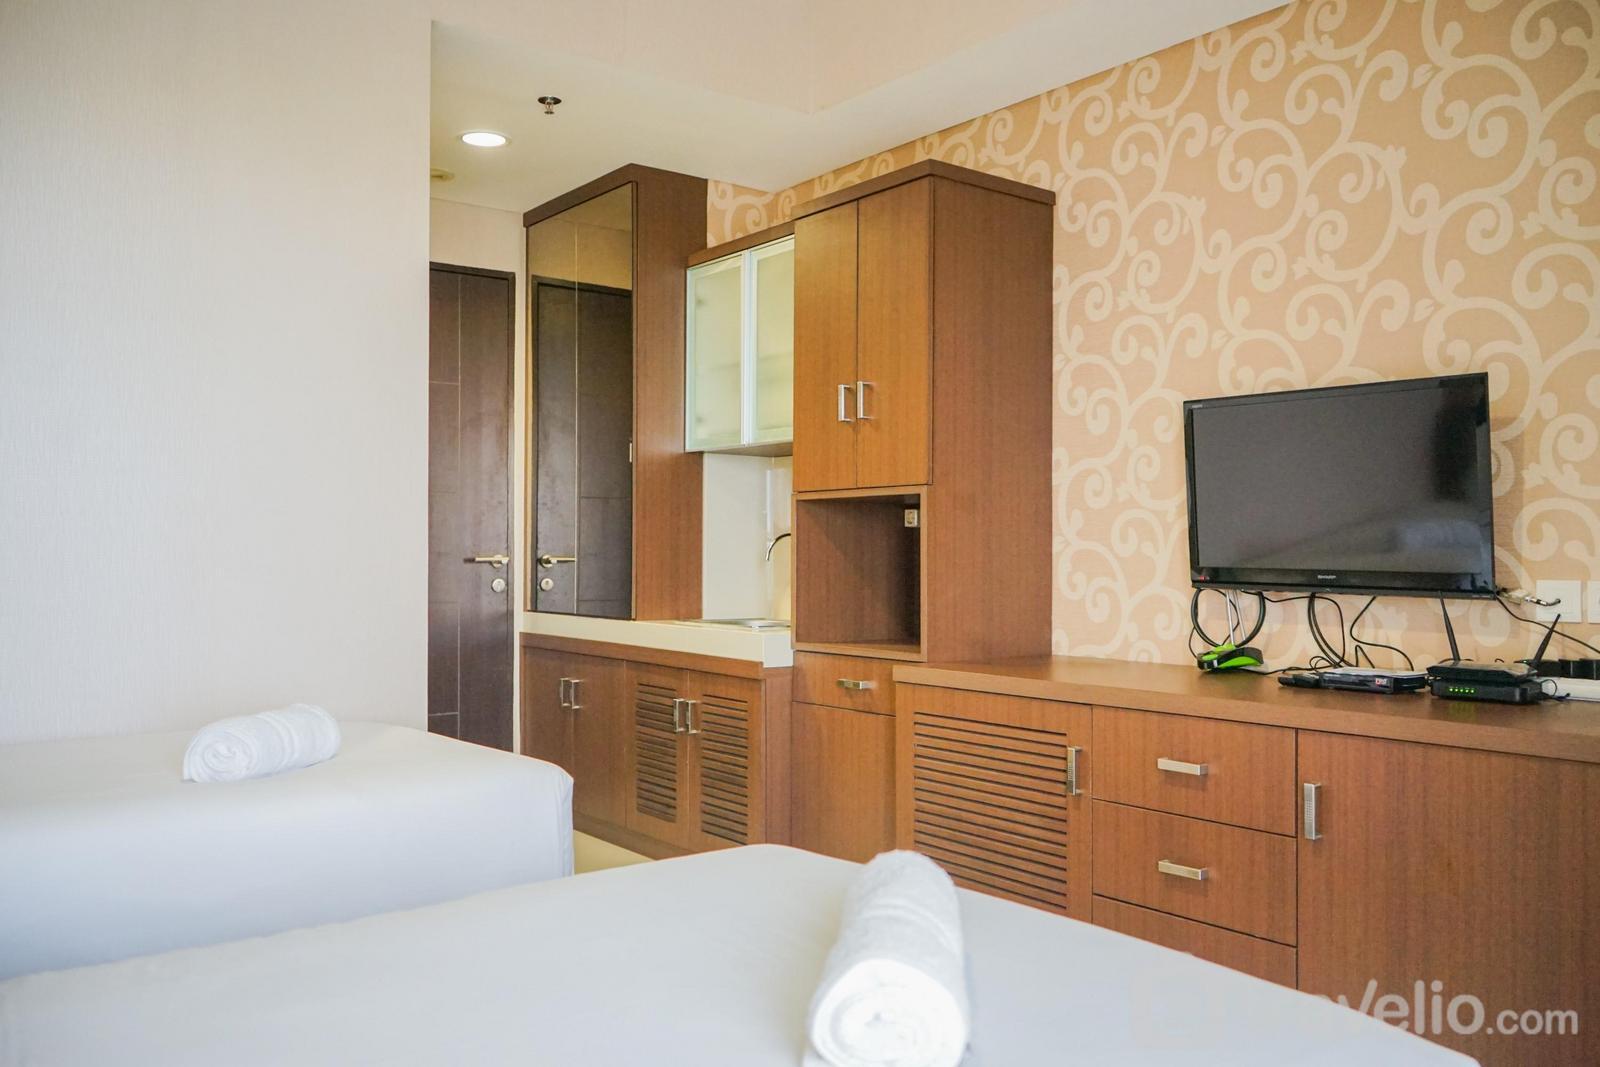 Atria Residences Gading Serpong - Compact and Cozy Studio Atria Apartment By Travelio